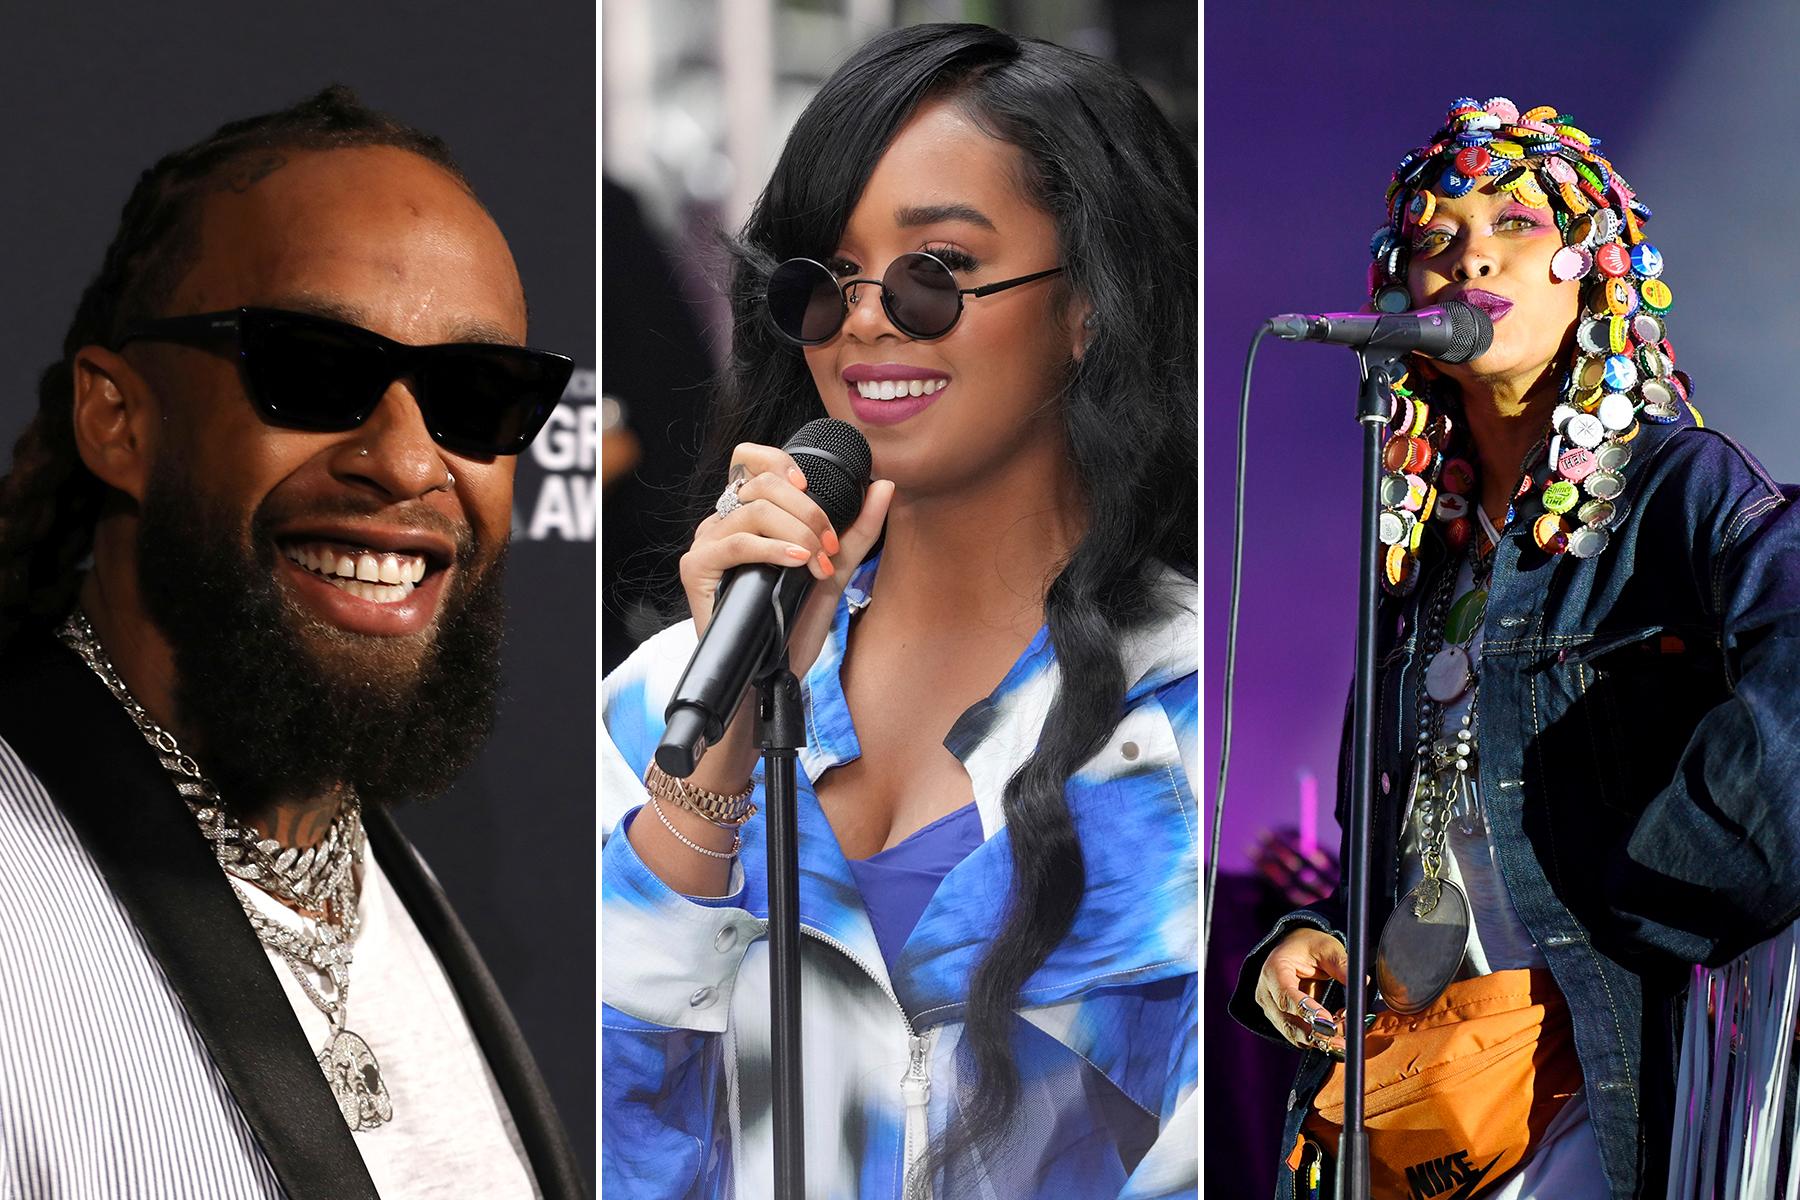 Ty Dolla $ign, Erykah Badu Join Lineup for H.E.R.'s Lights On Festival